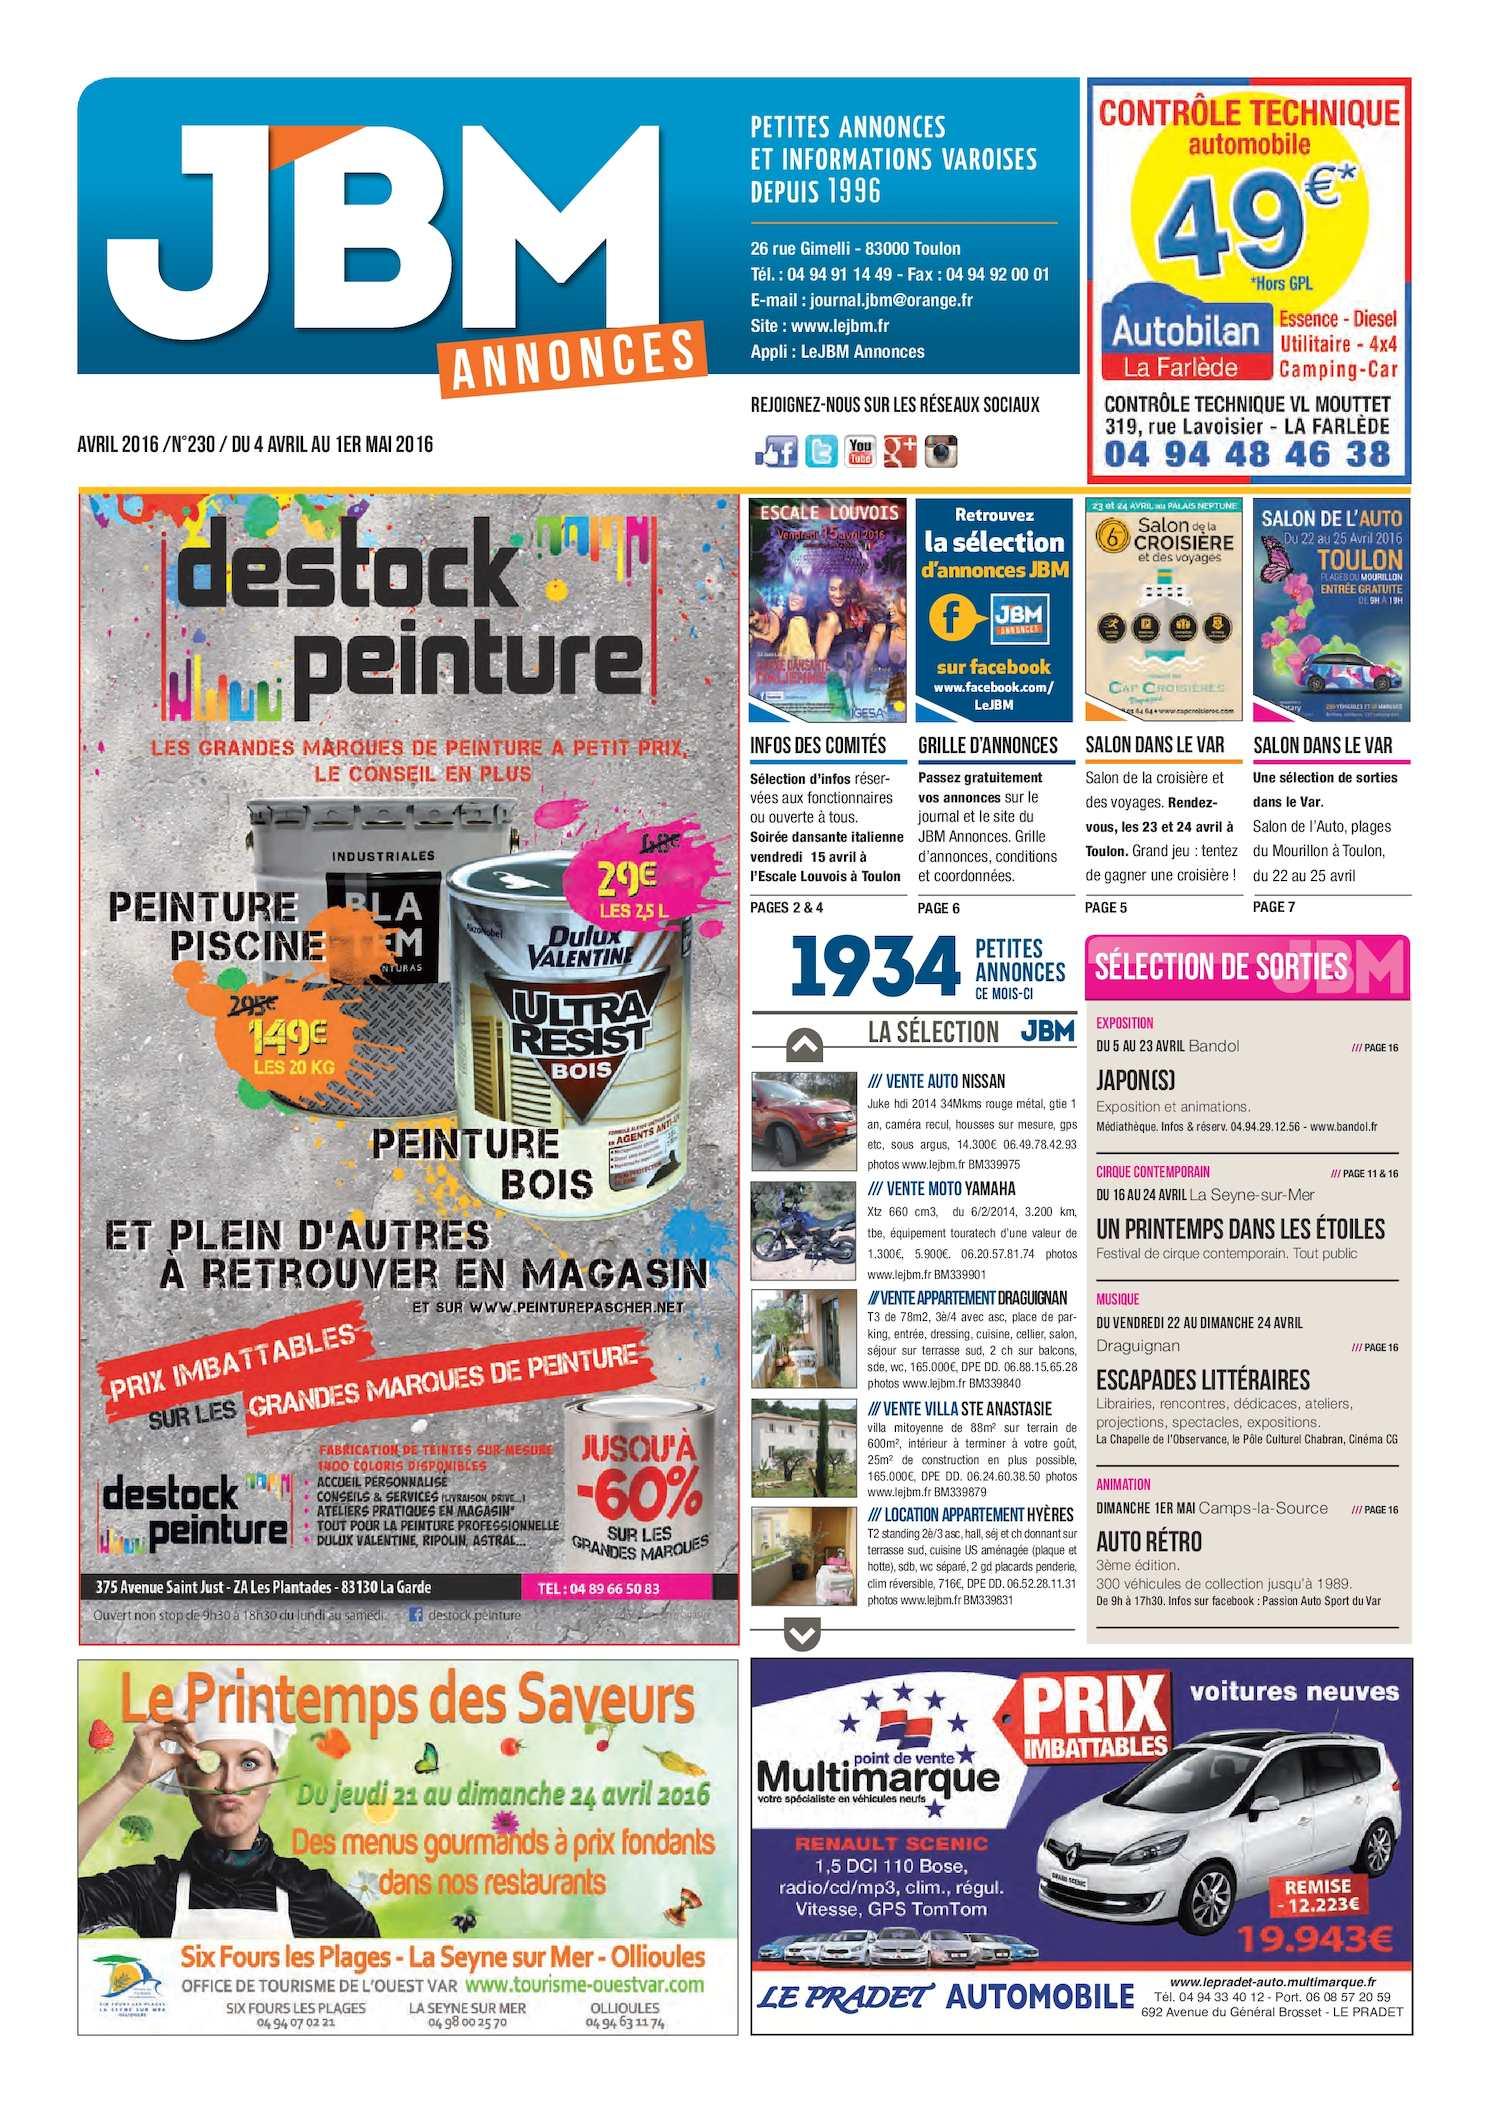 Calaméo - Journal JBM Annonces n°230 Avril 2016 8437e500b50